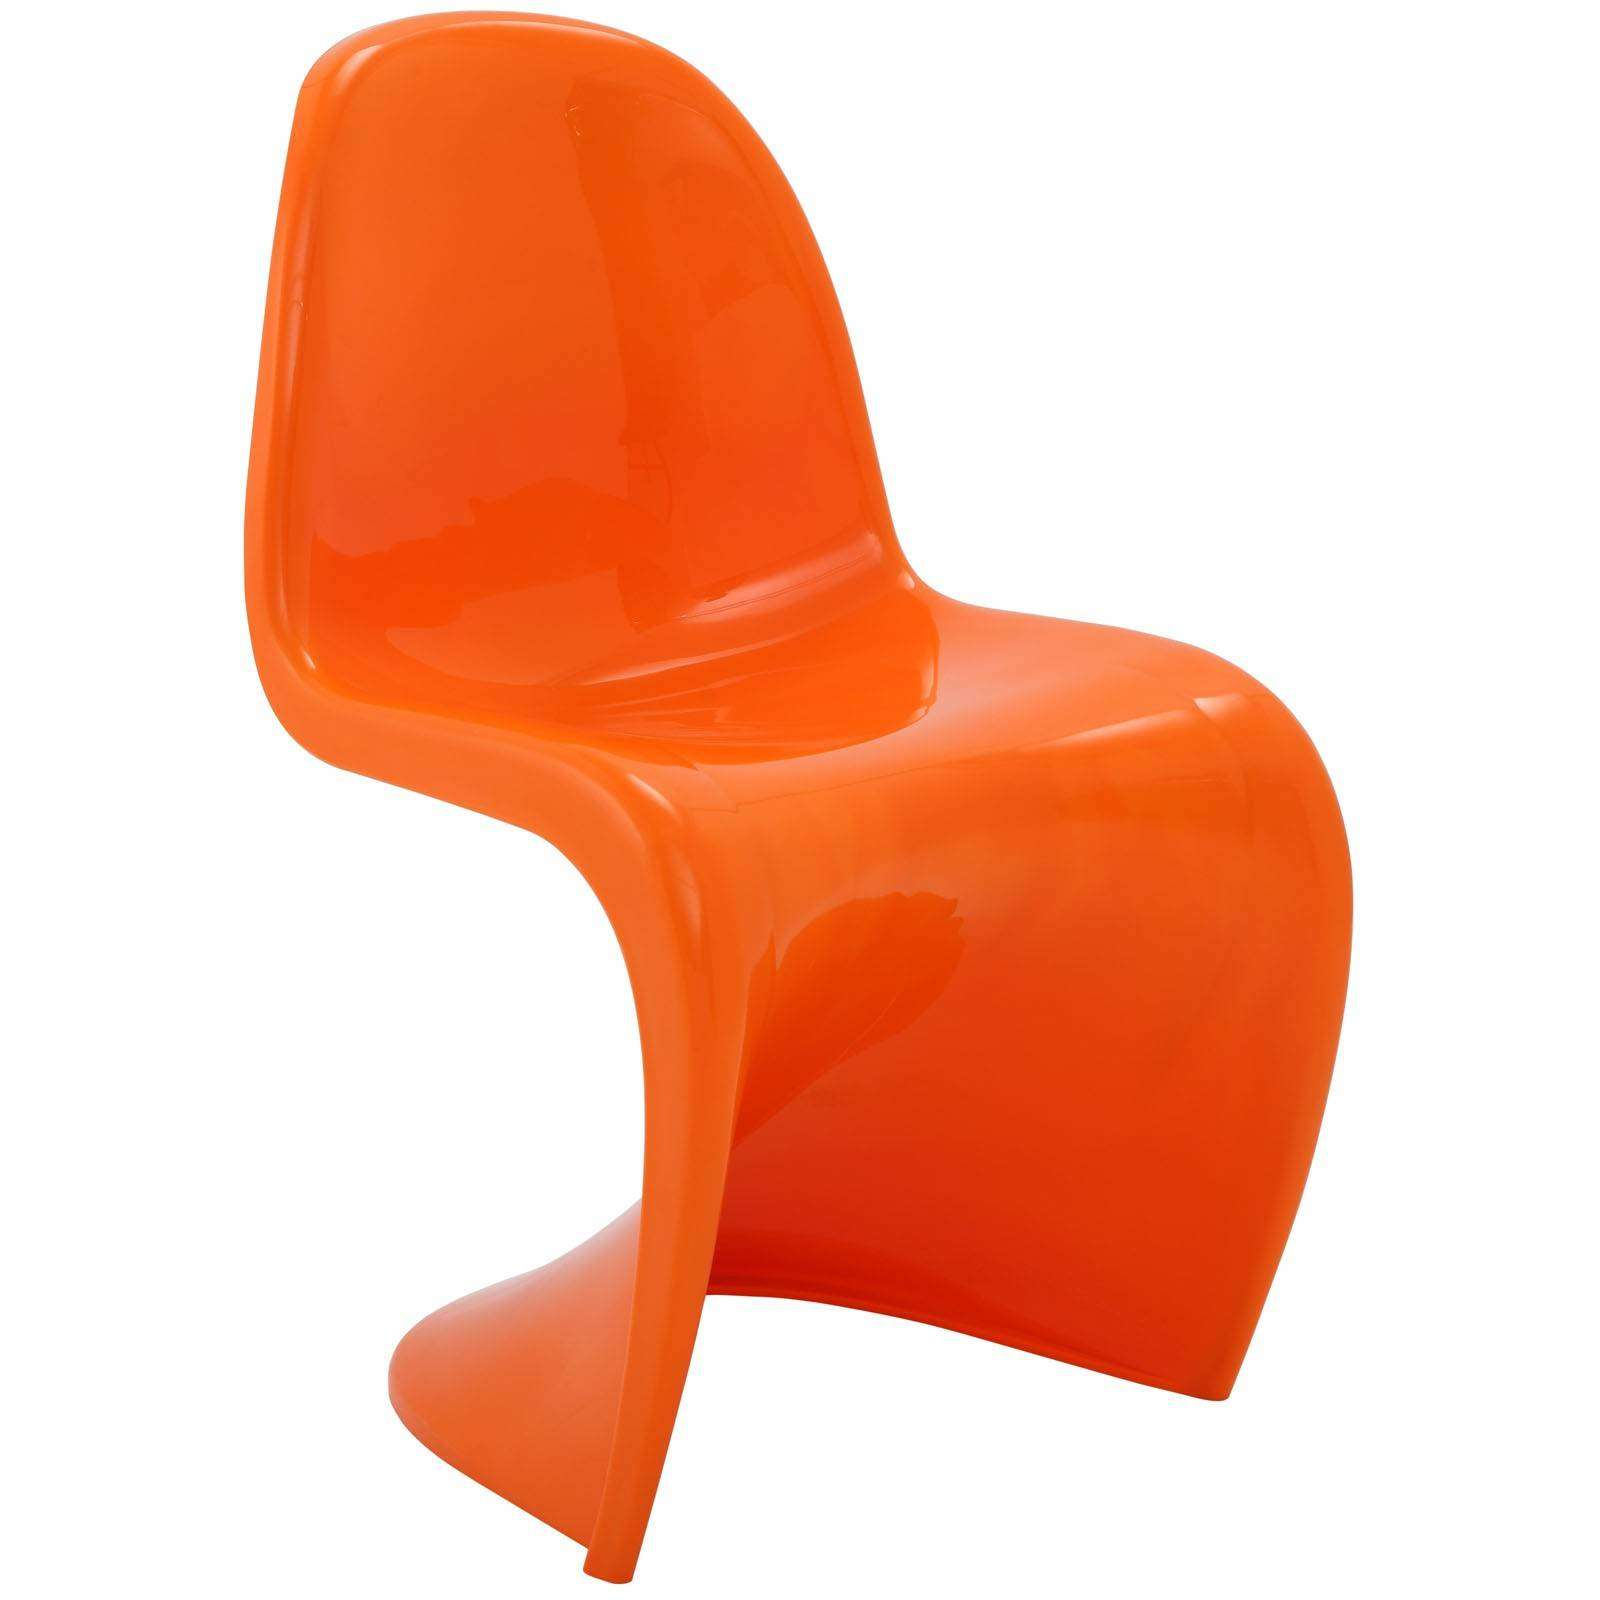 Verner Panton Style Chair